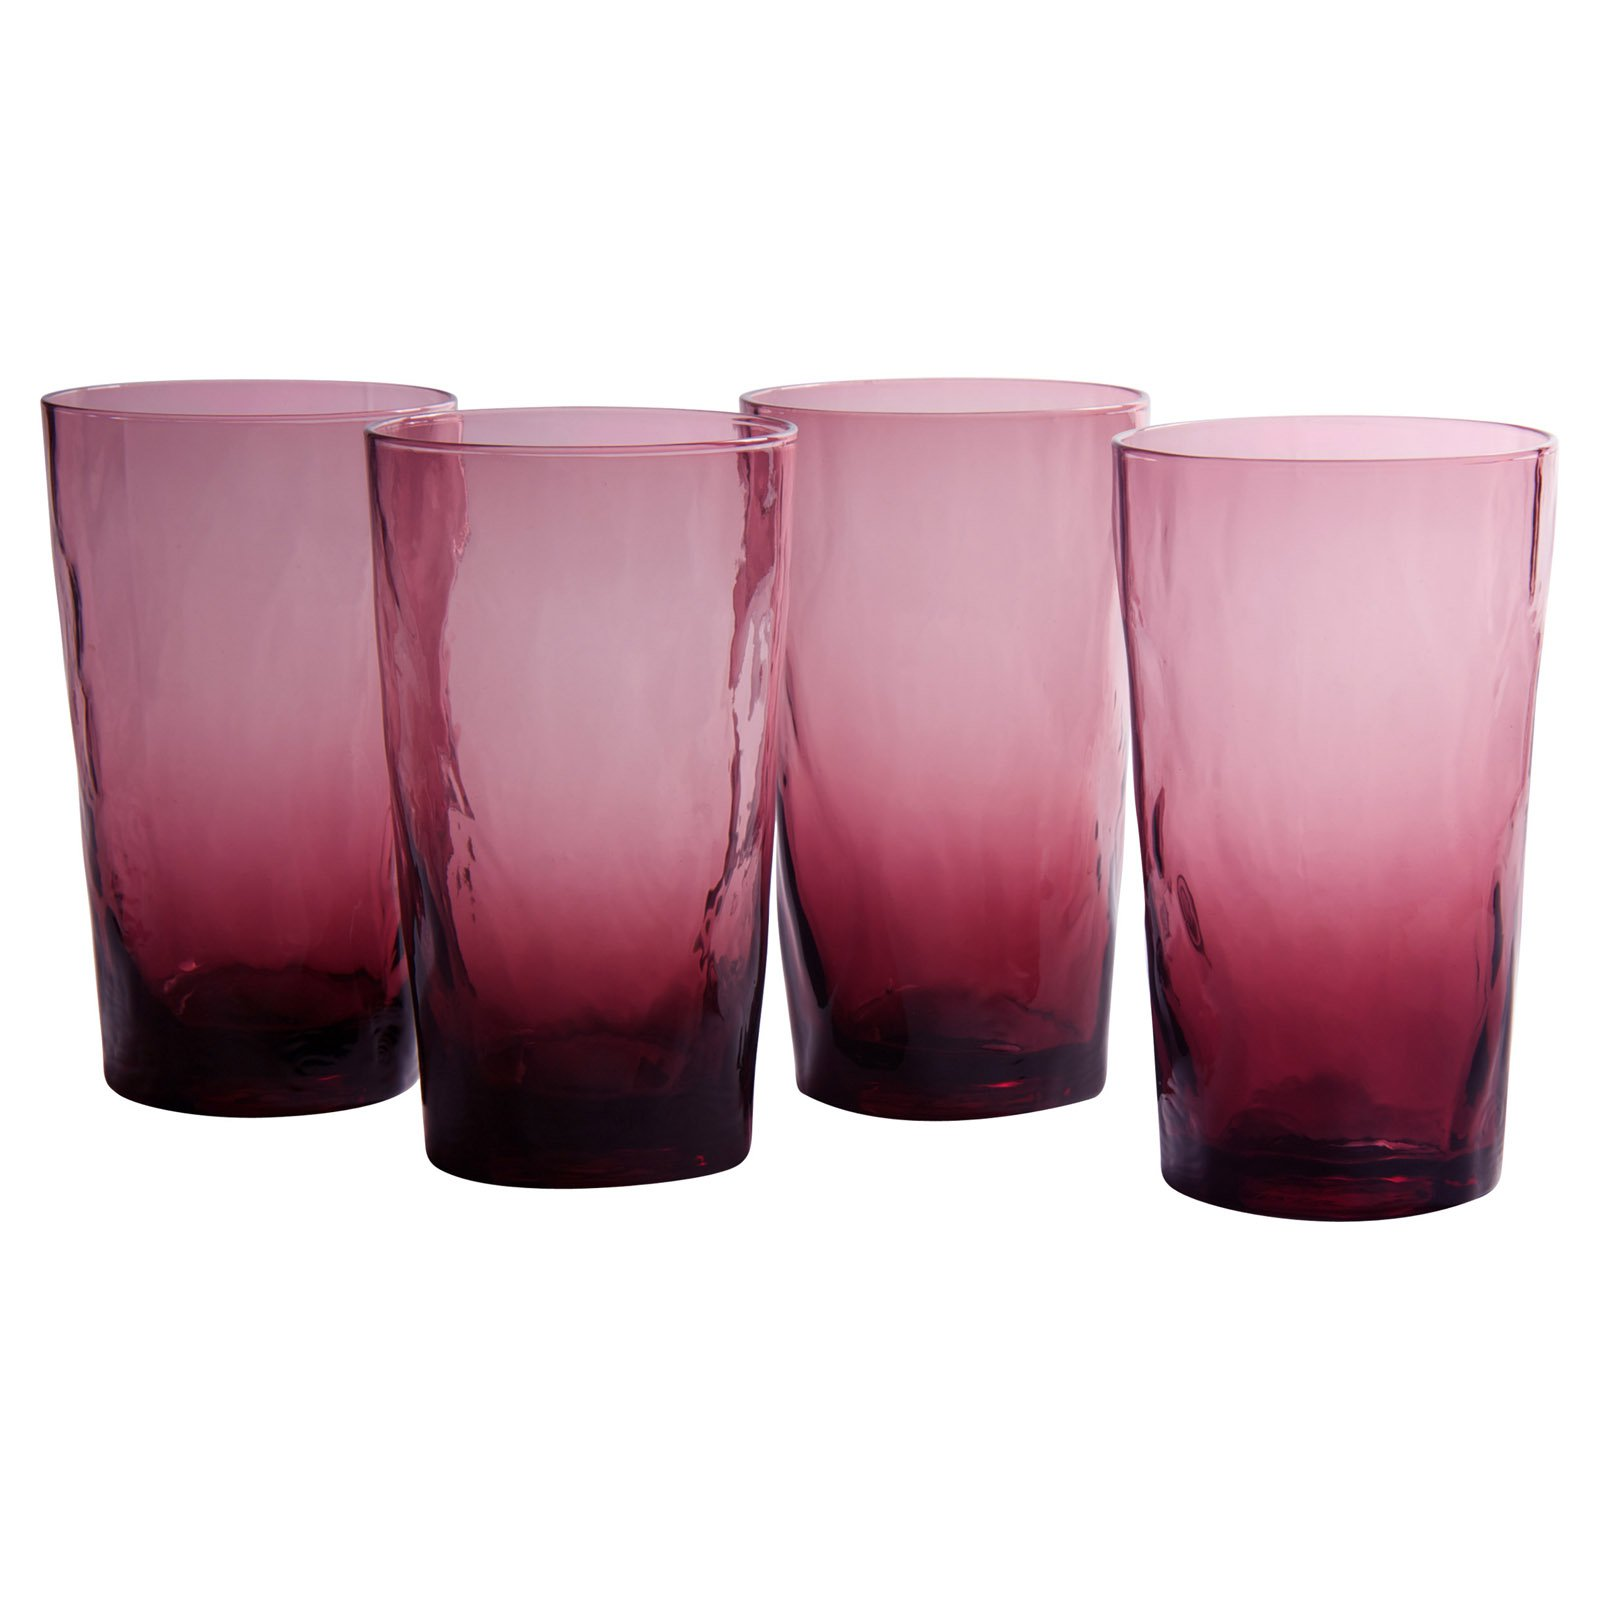 Artland Ripple Highball Glass - Set of 4